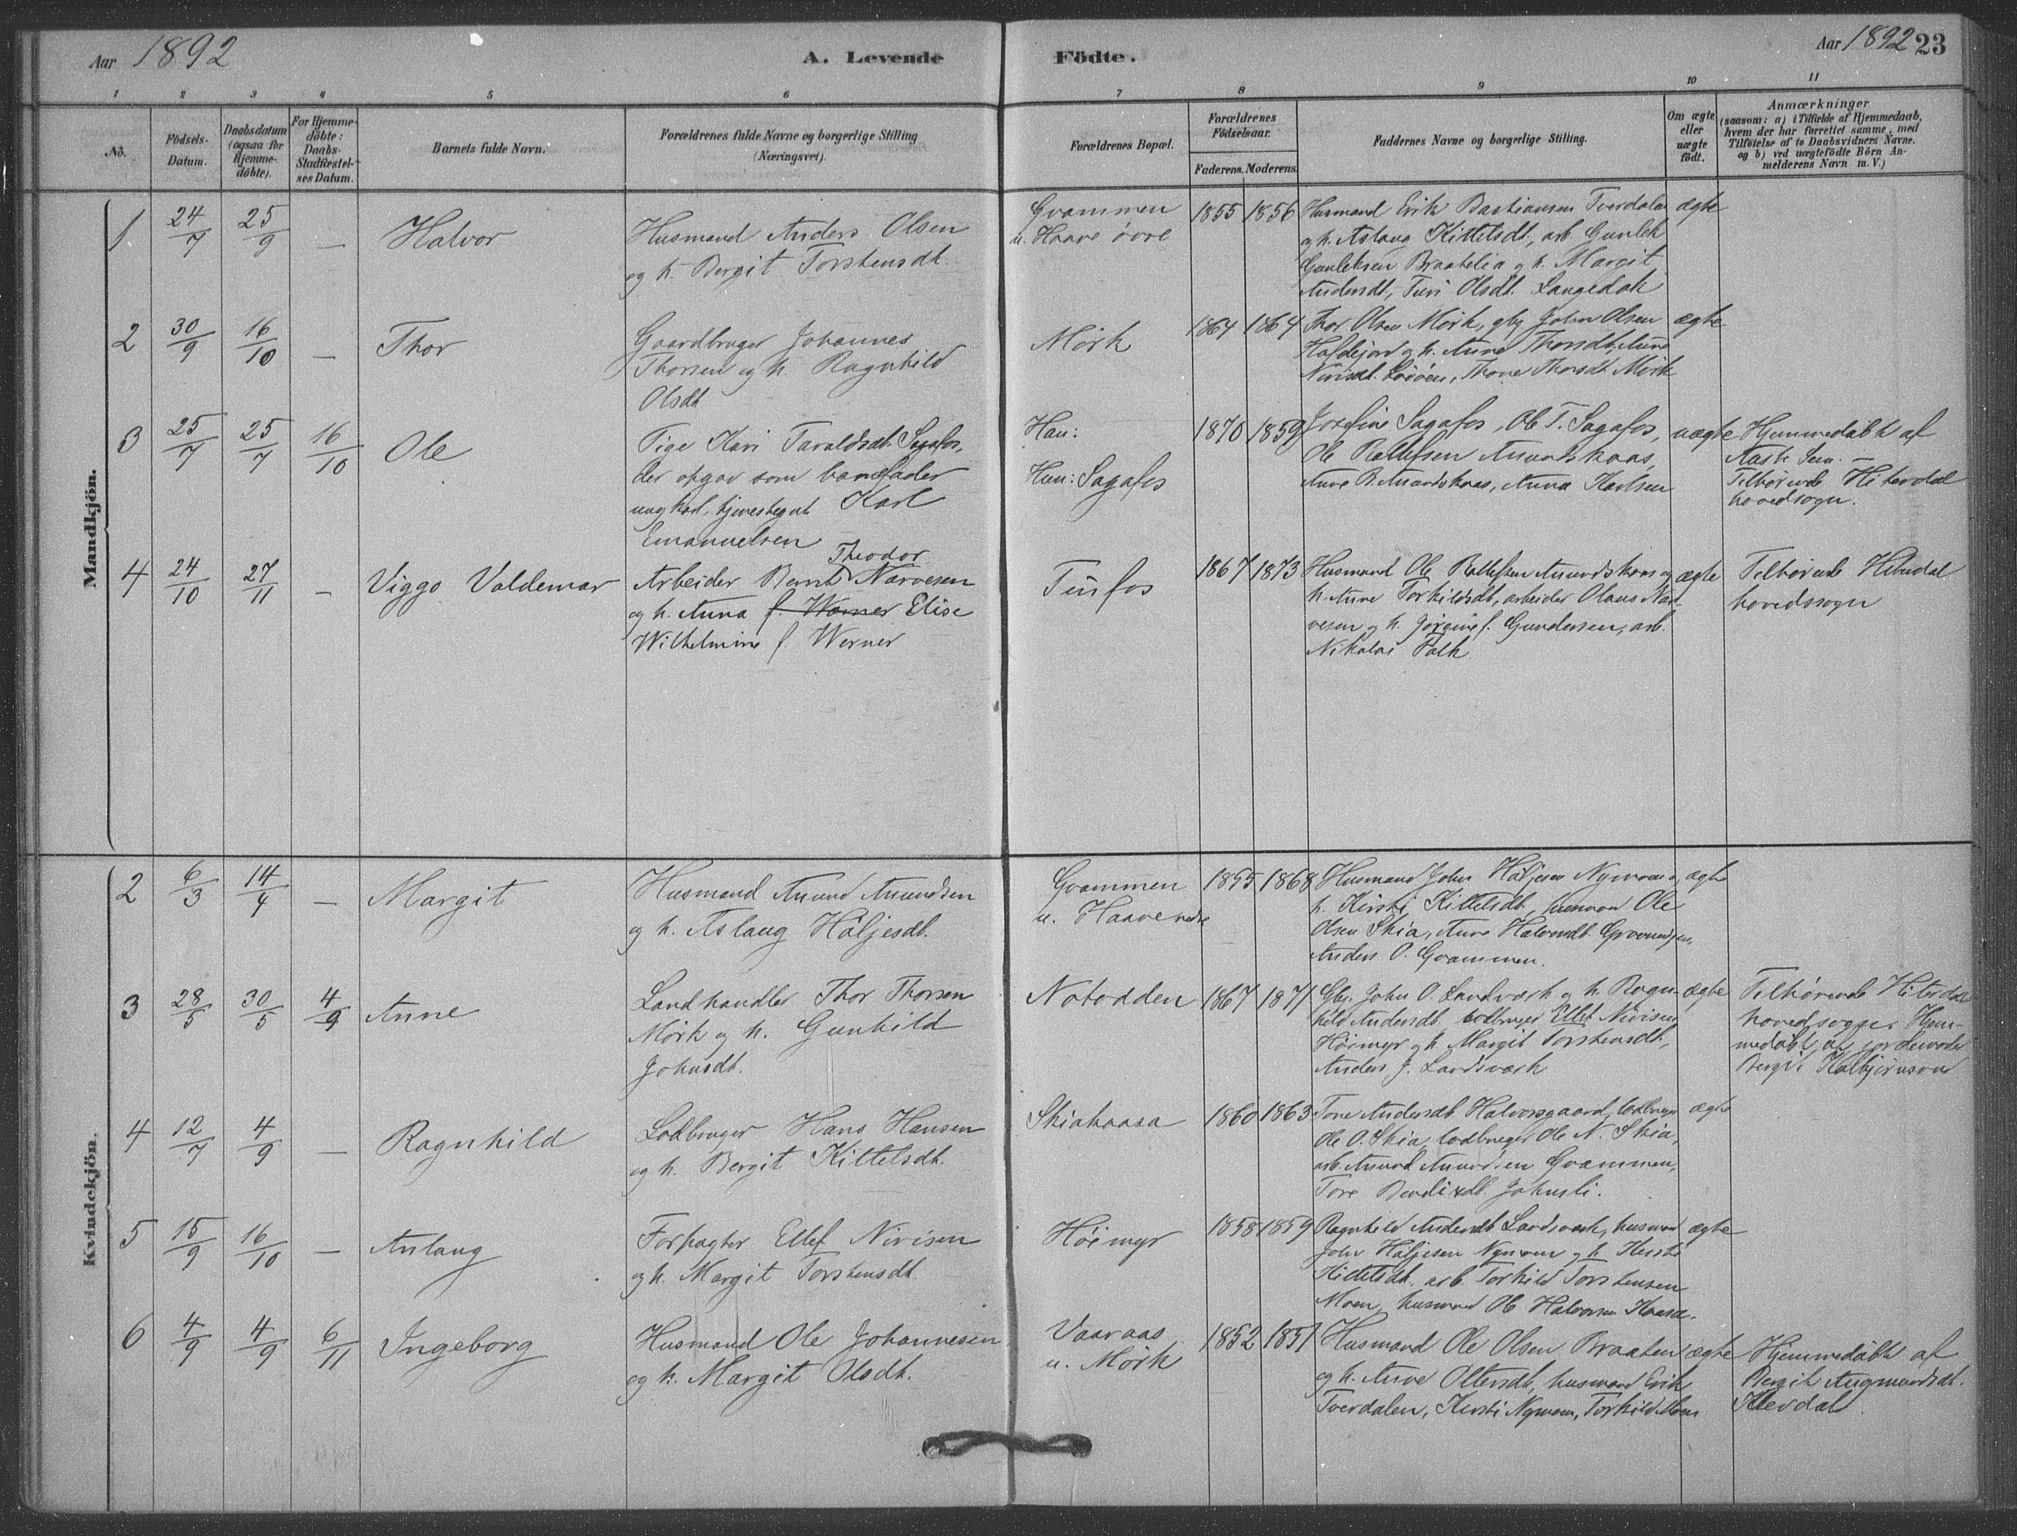 SAKO, Heddal kirkebøker, F/Fb/L0002: Ministerialbok nr. II 2, 1878-1913, s. 23